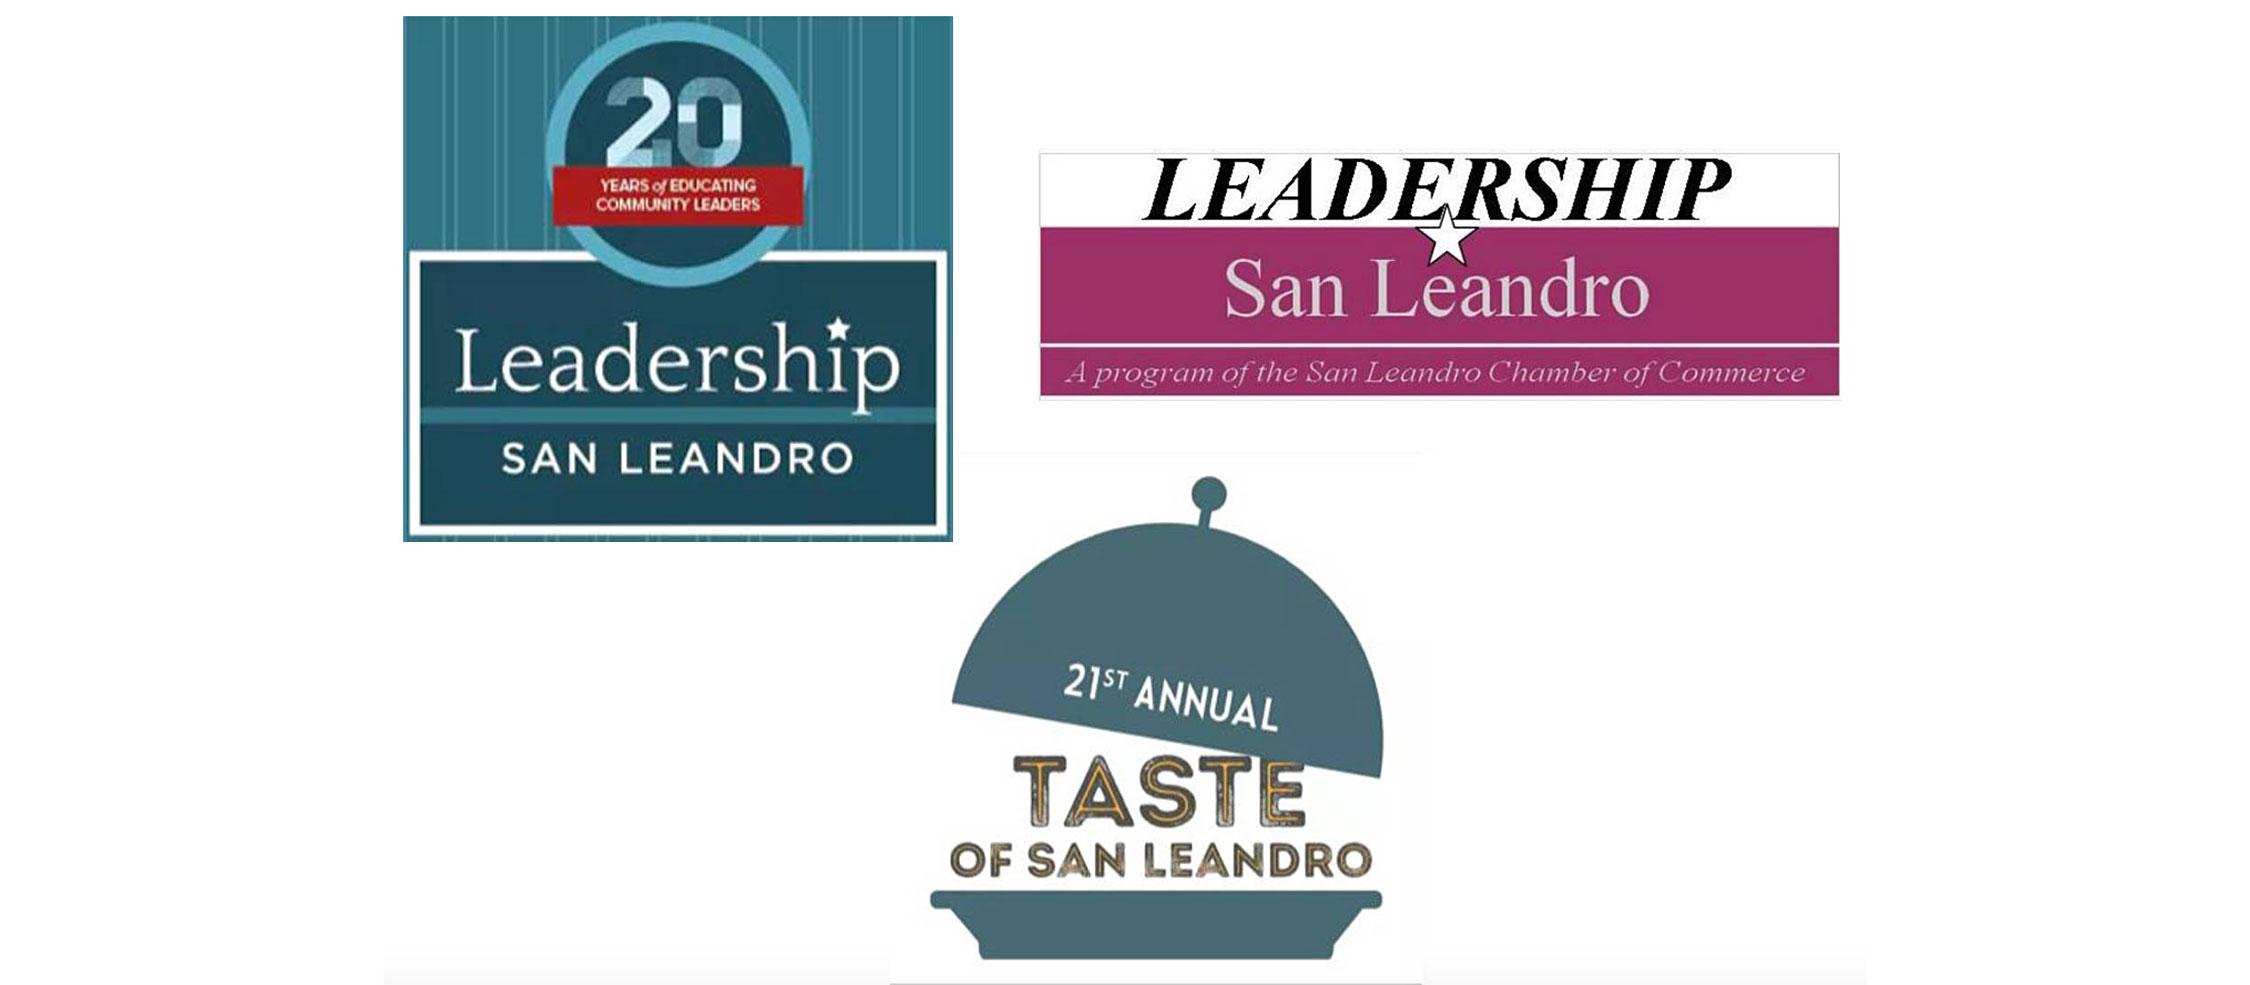 Original Leadership San Leandro and The Taste of San Leandro logo